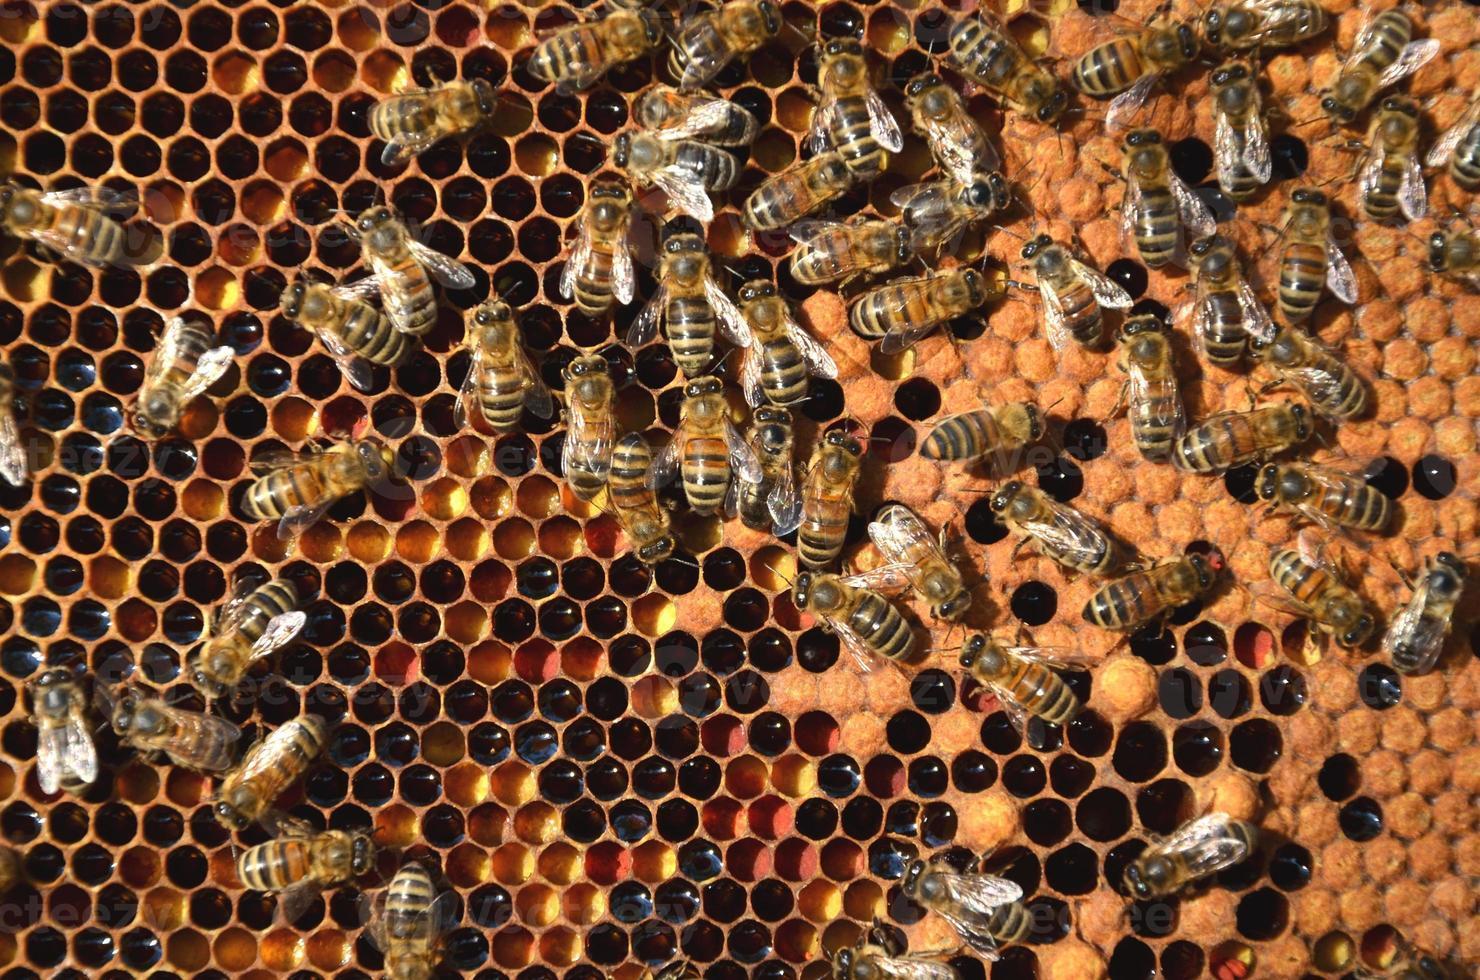 abejas trabajadoras en panal foto